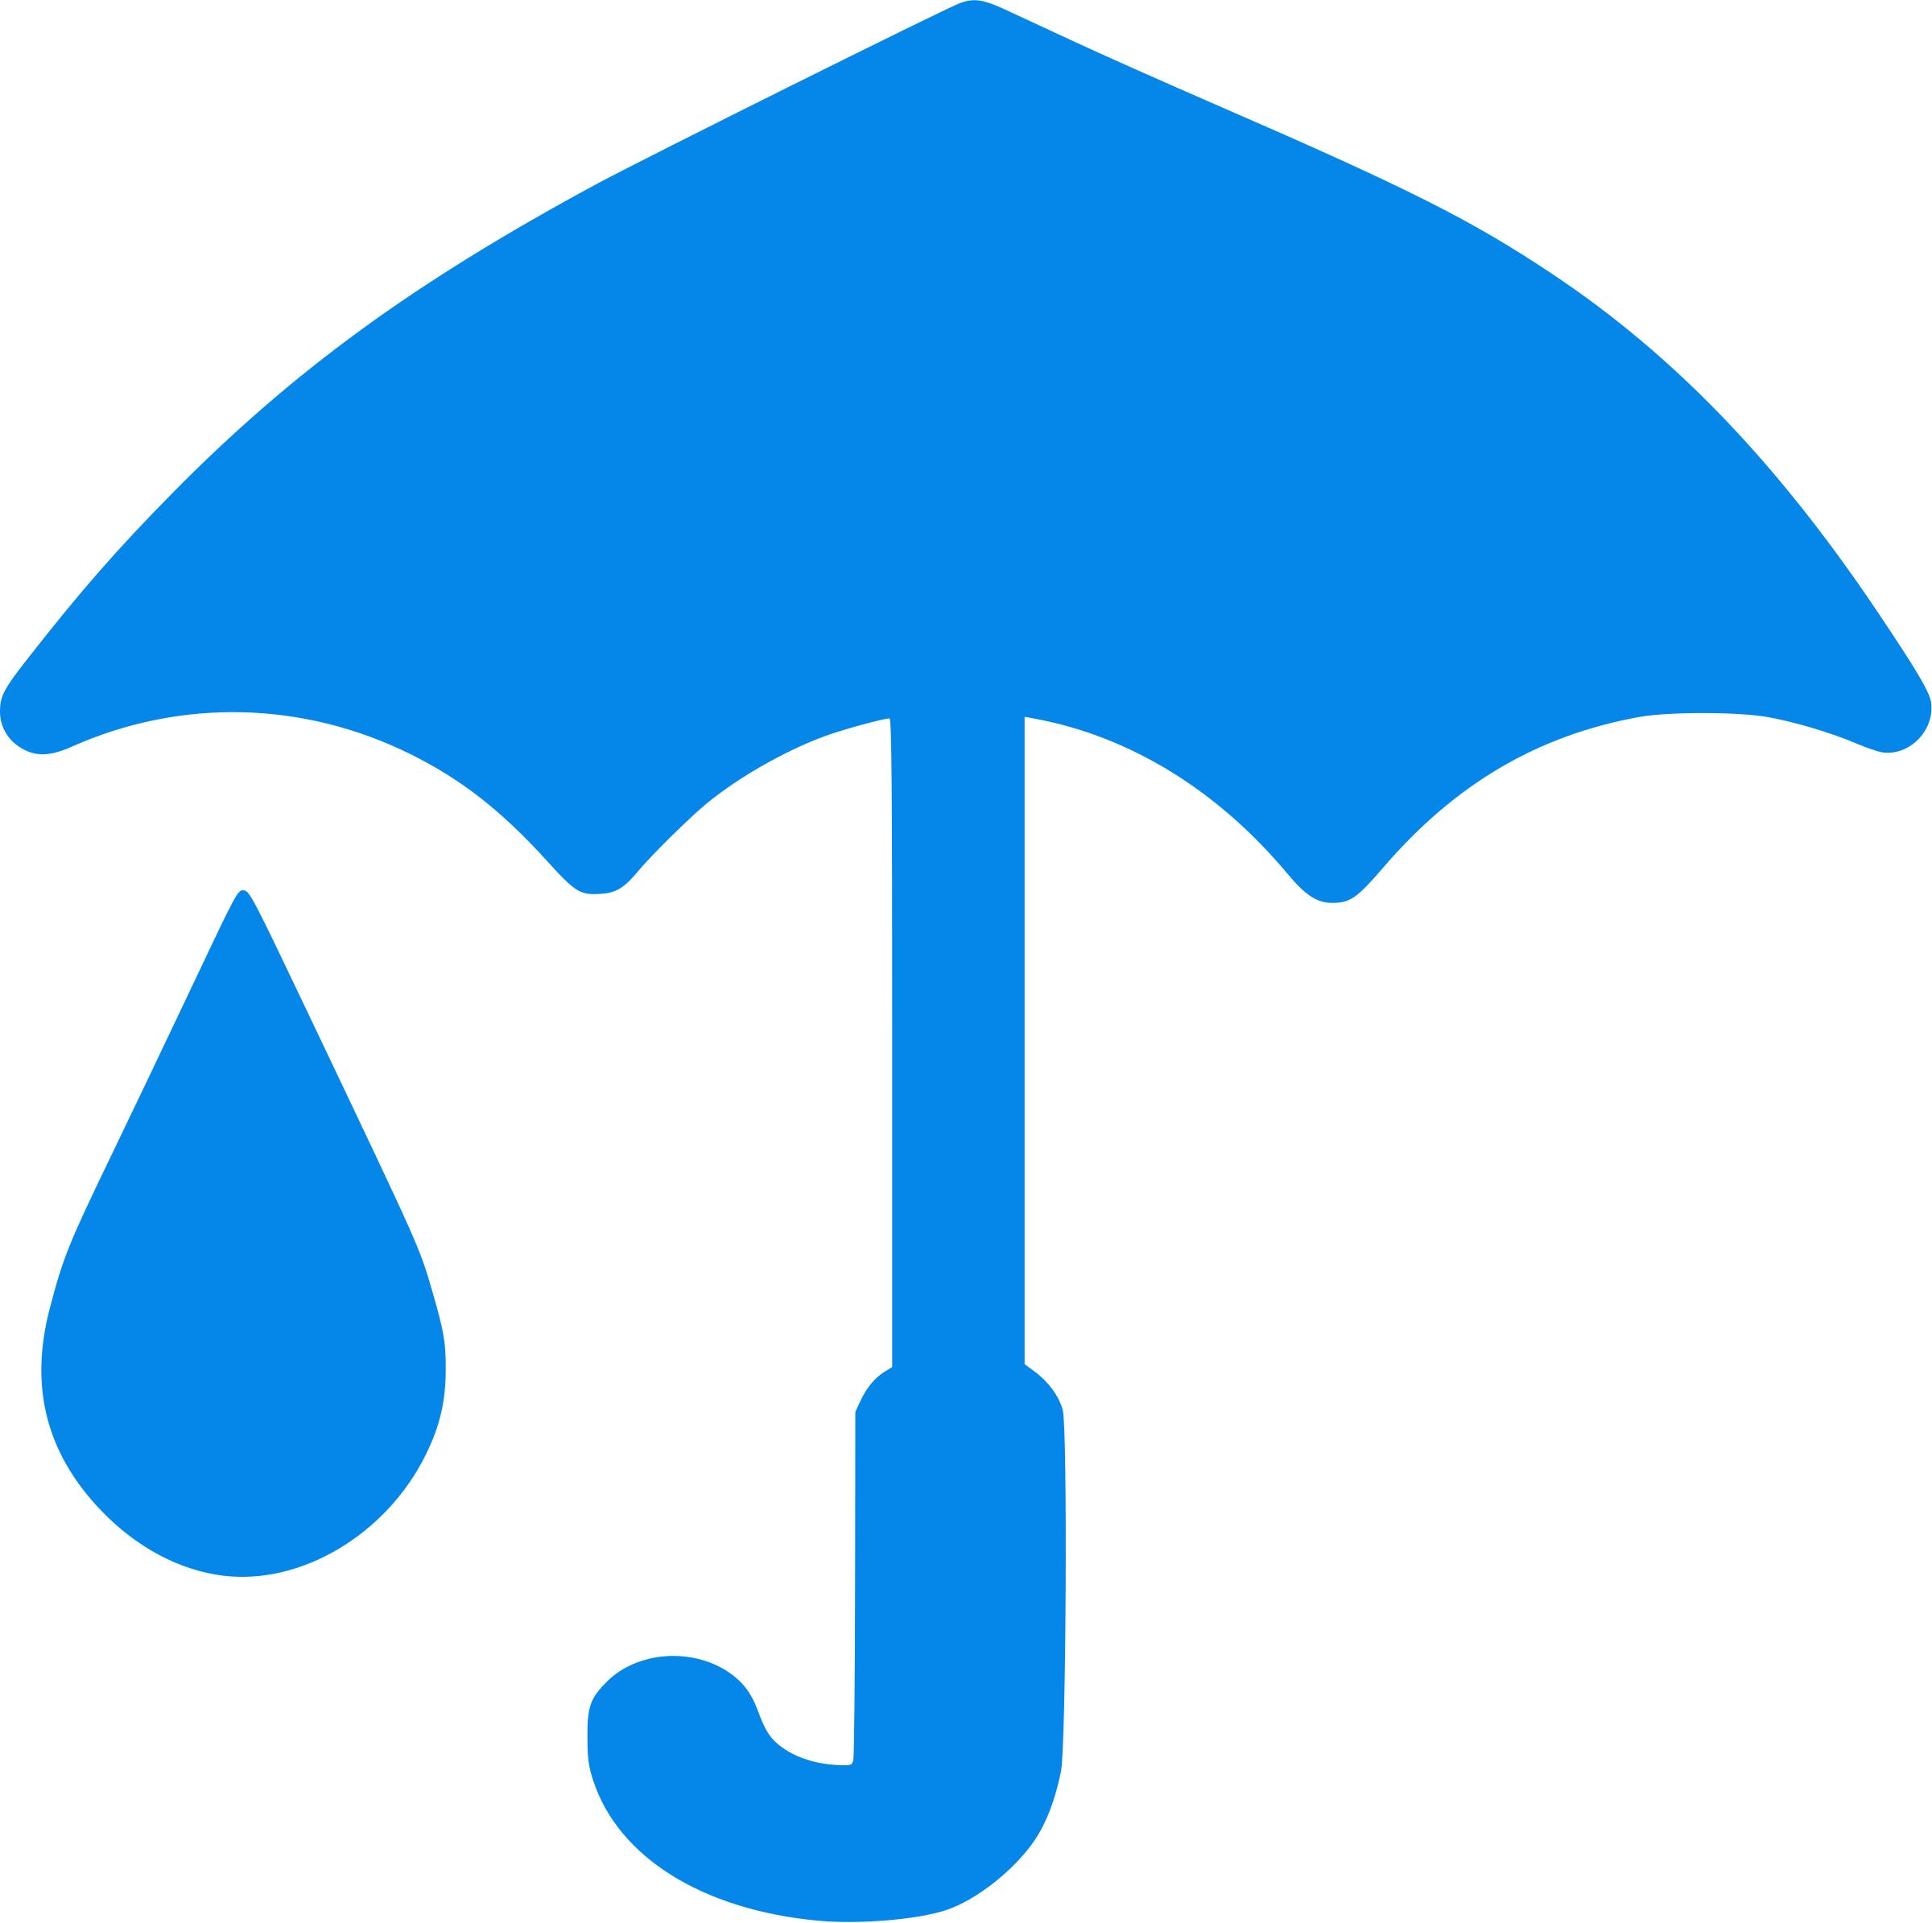 Clipart blue umbrella and raindrop icon